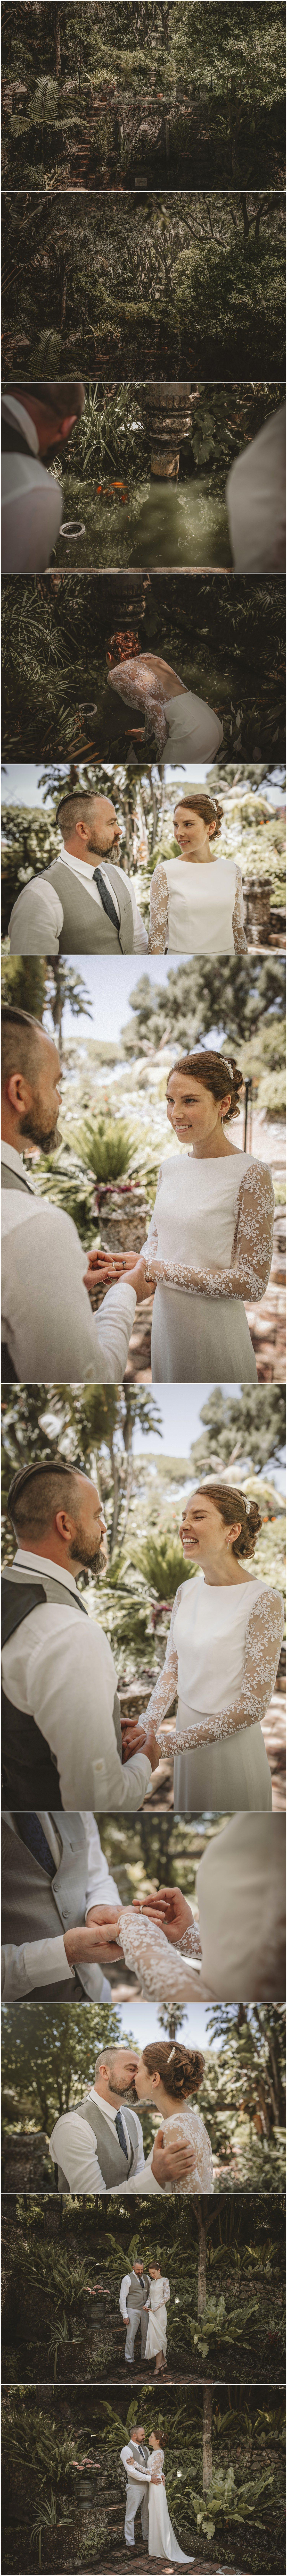 Alameda, Gibraltar, Wedding, wedding in the alameda botanic gibraltar garden